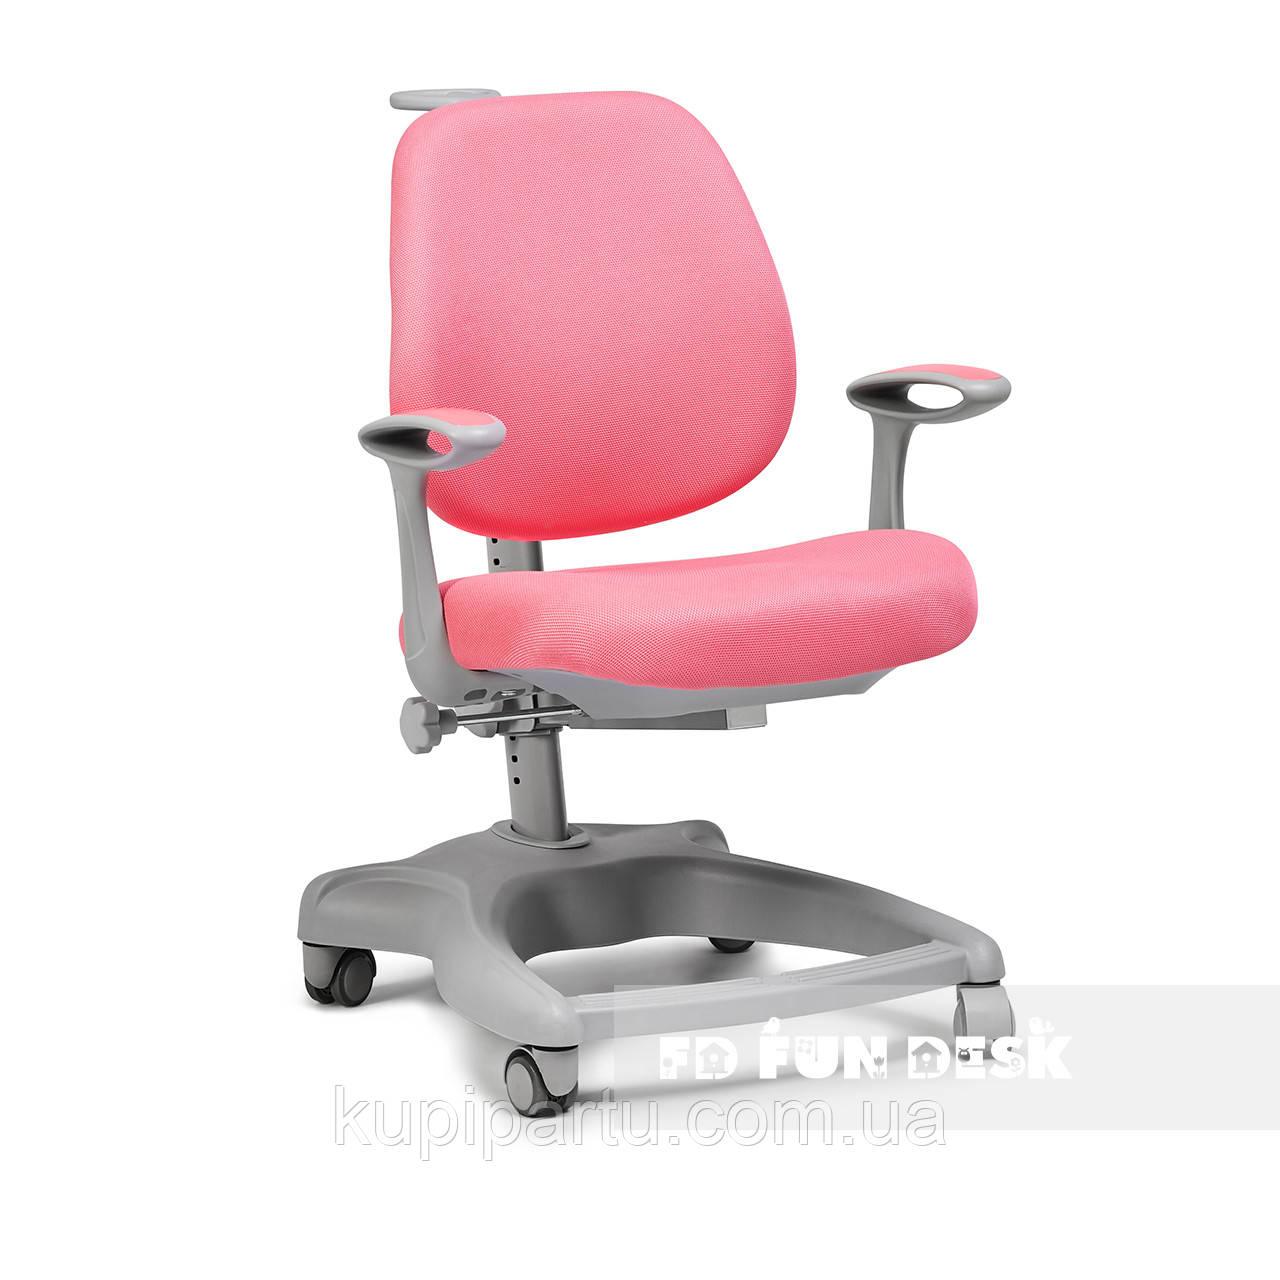 Ортопедичне крісло для дівчинки FunDesk Delizia Pink